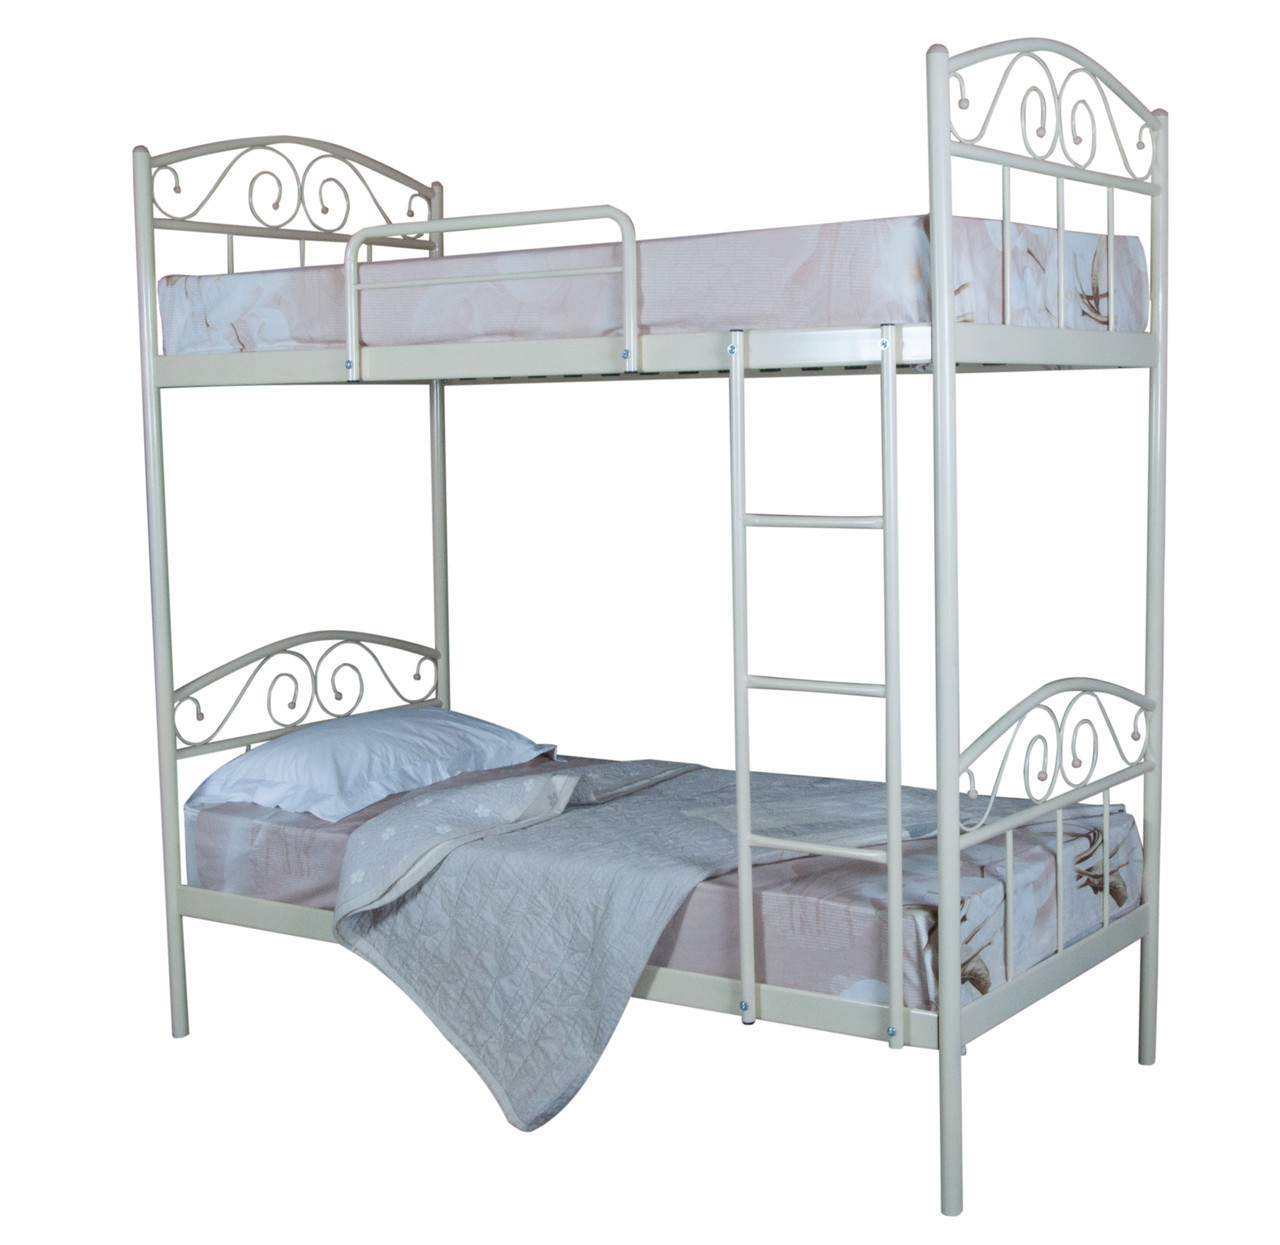 Кровать Элис Люкс двухъярусная 190х90, розовая